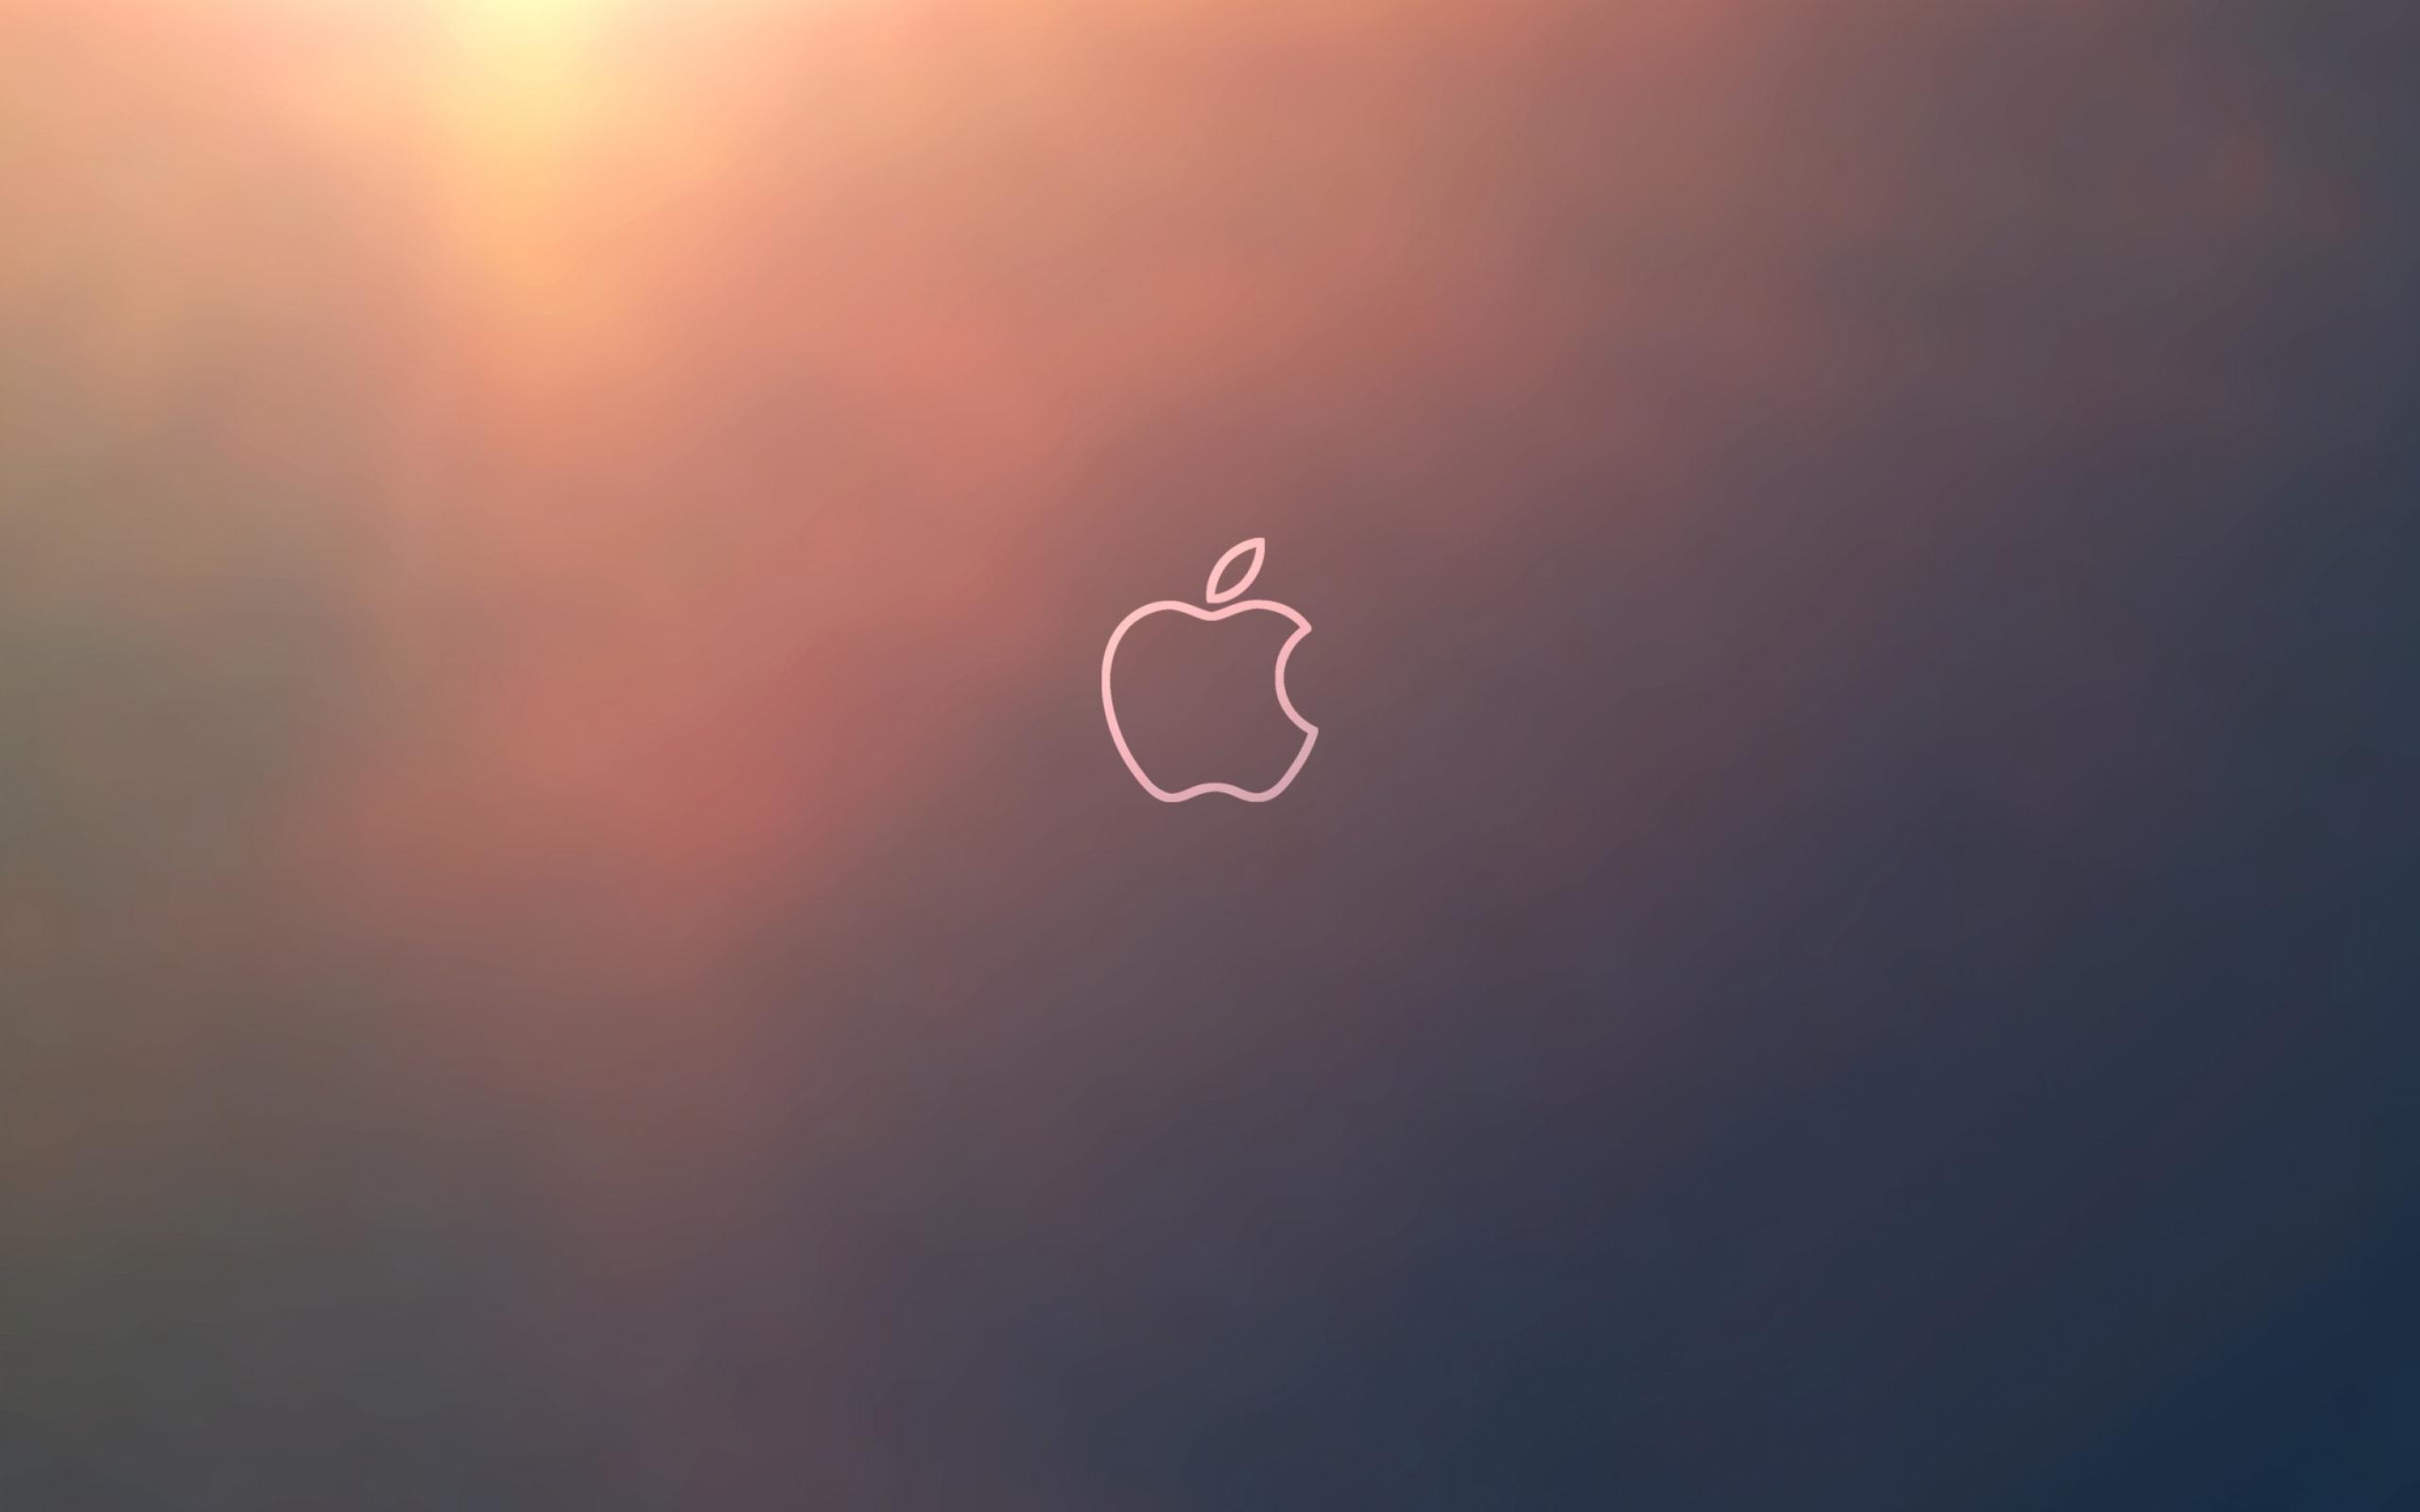 ... MacBook Pro 13-inch (2560x1600)